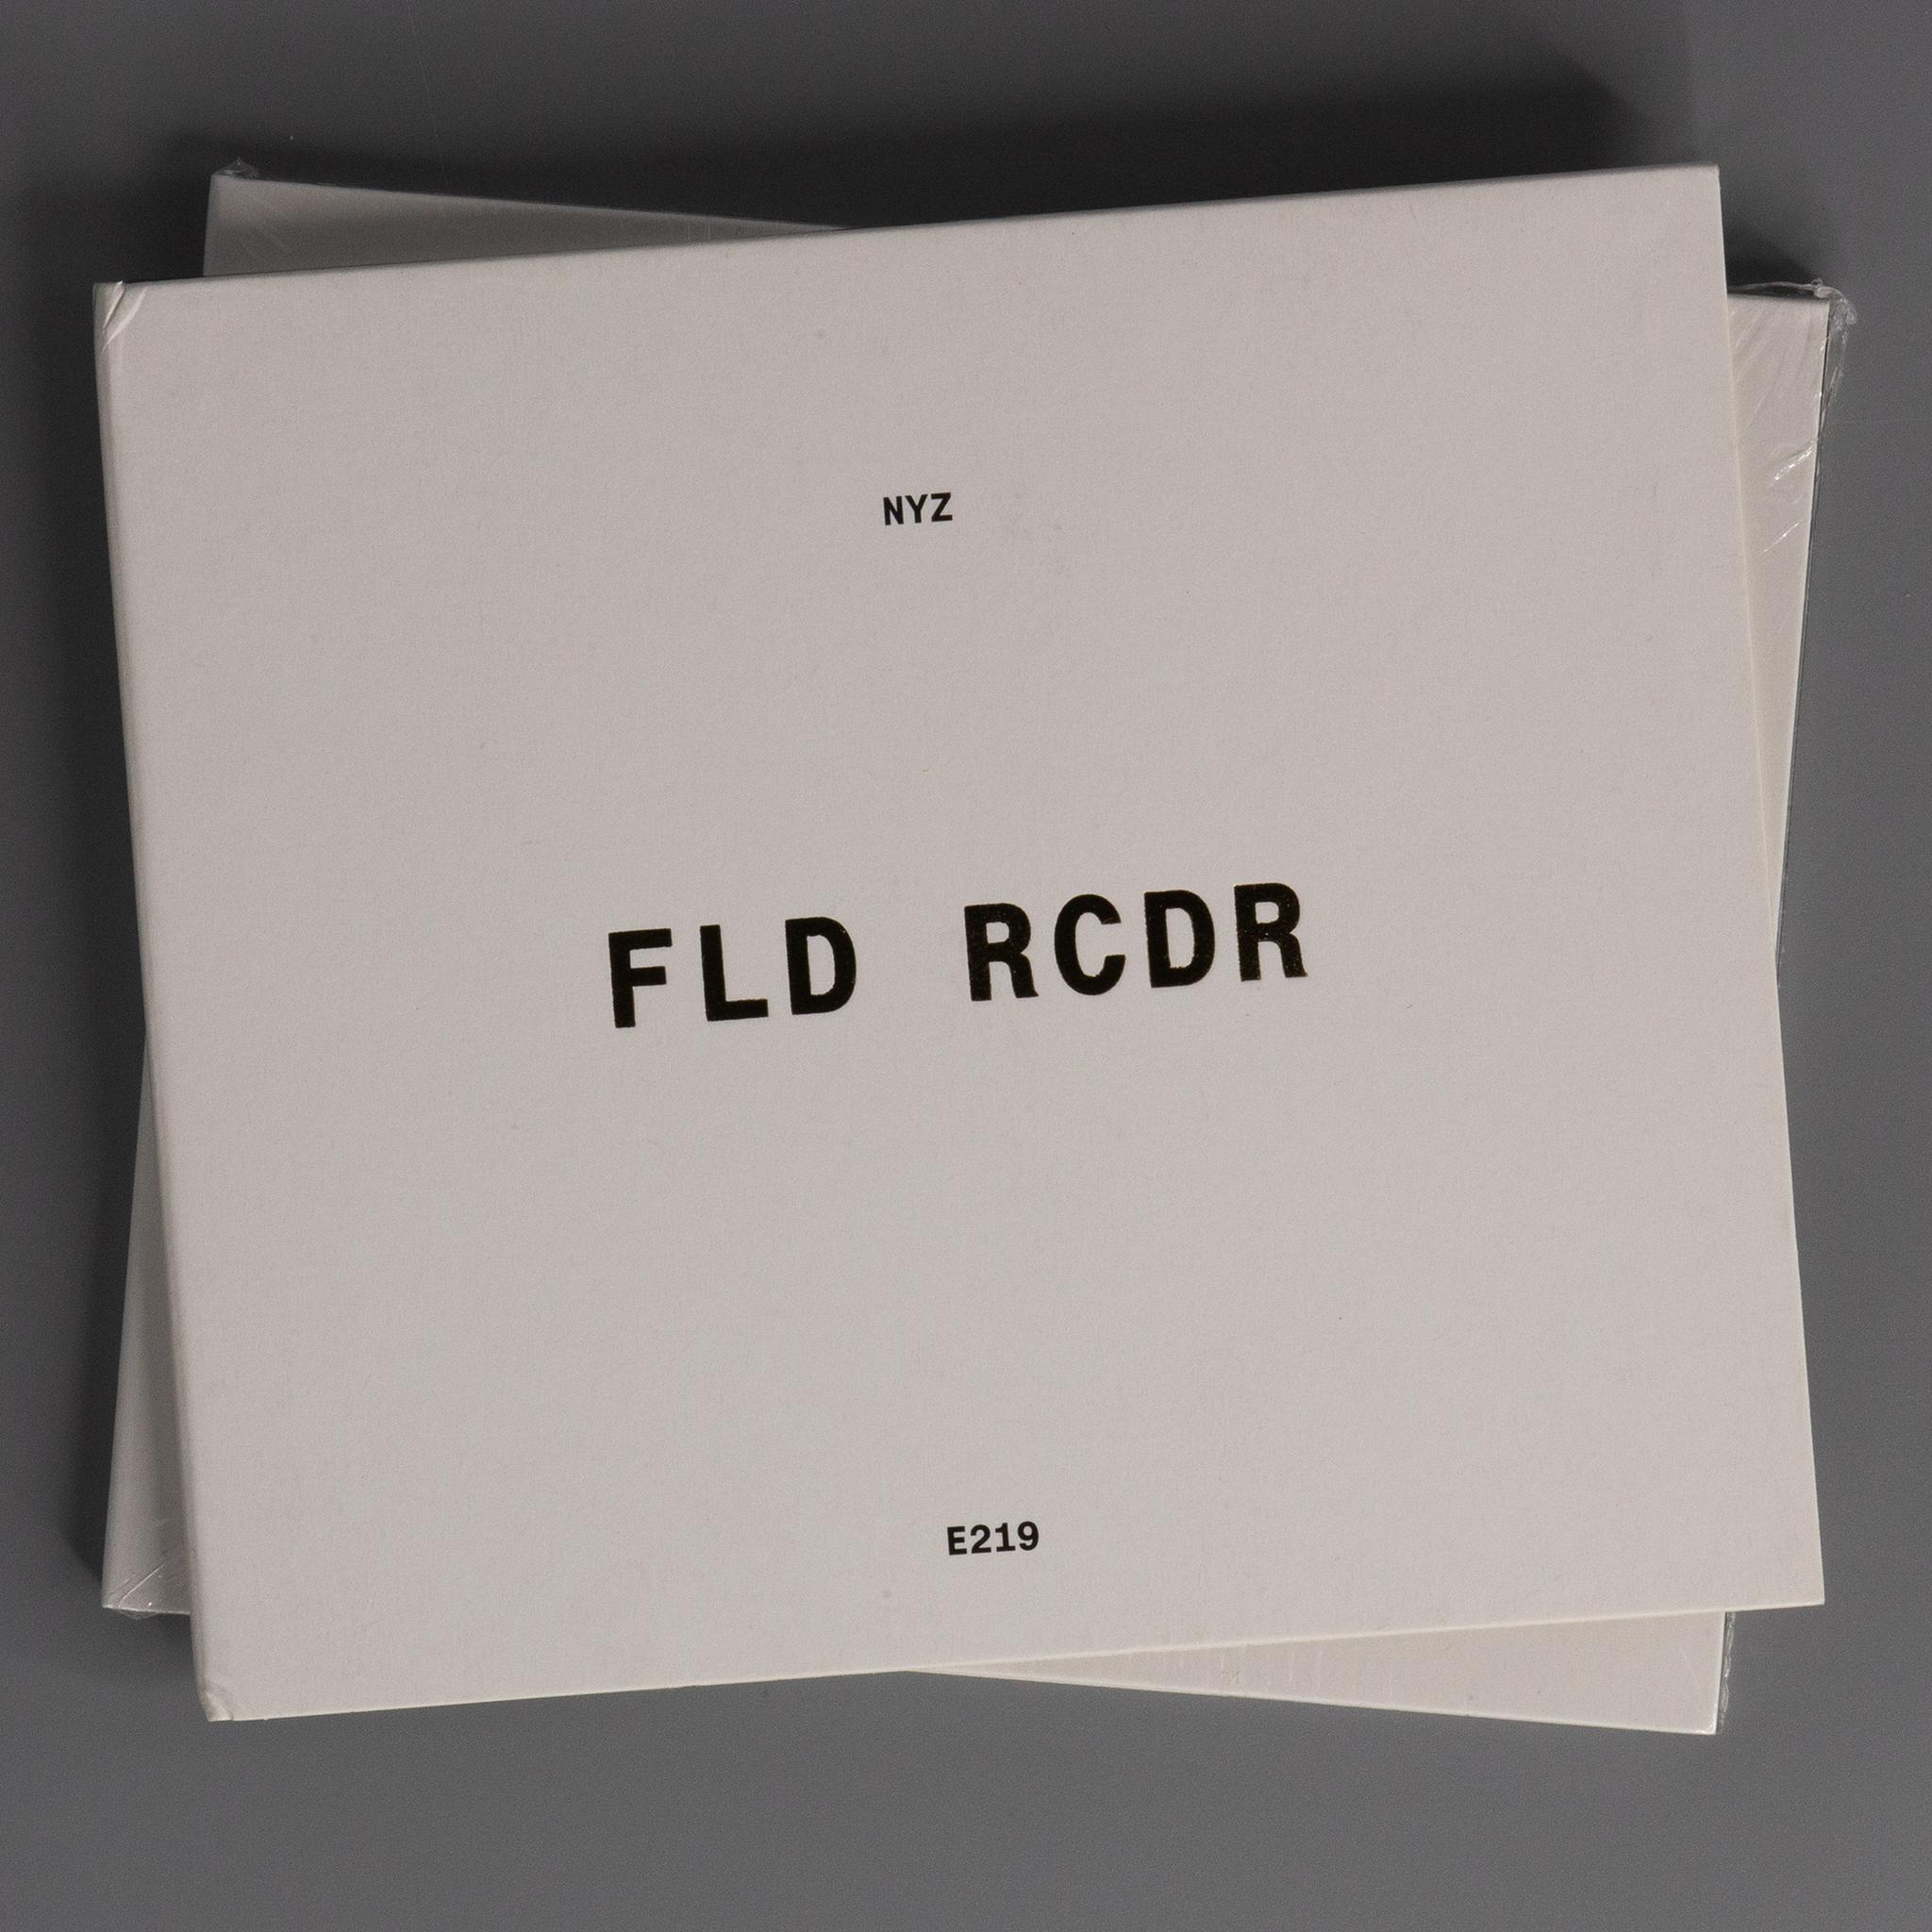 FLD RCDR